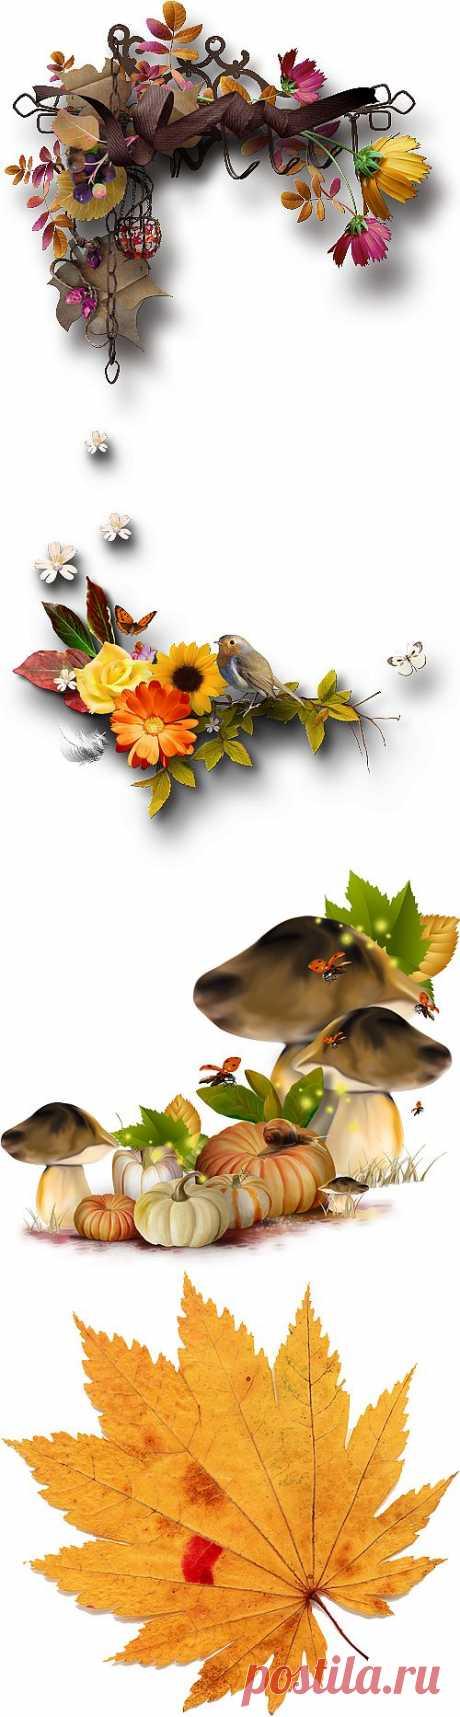 Осенний клипарт,декор PNG.